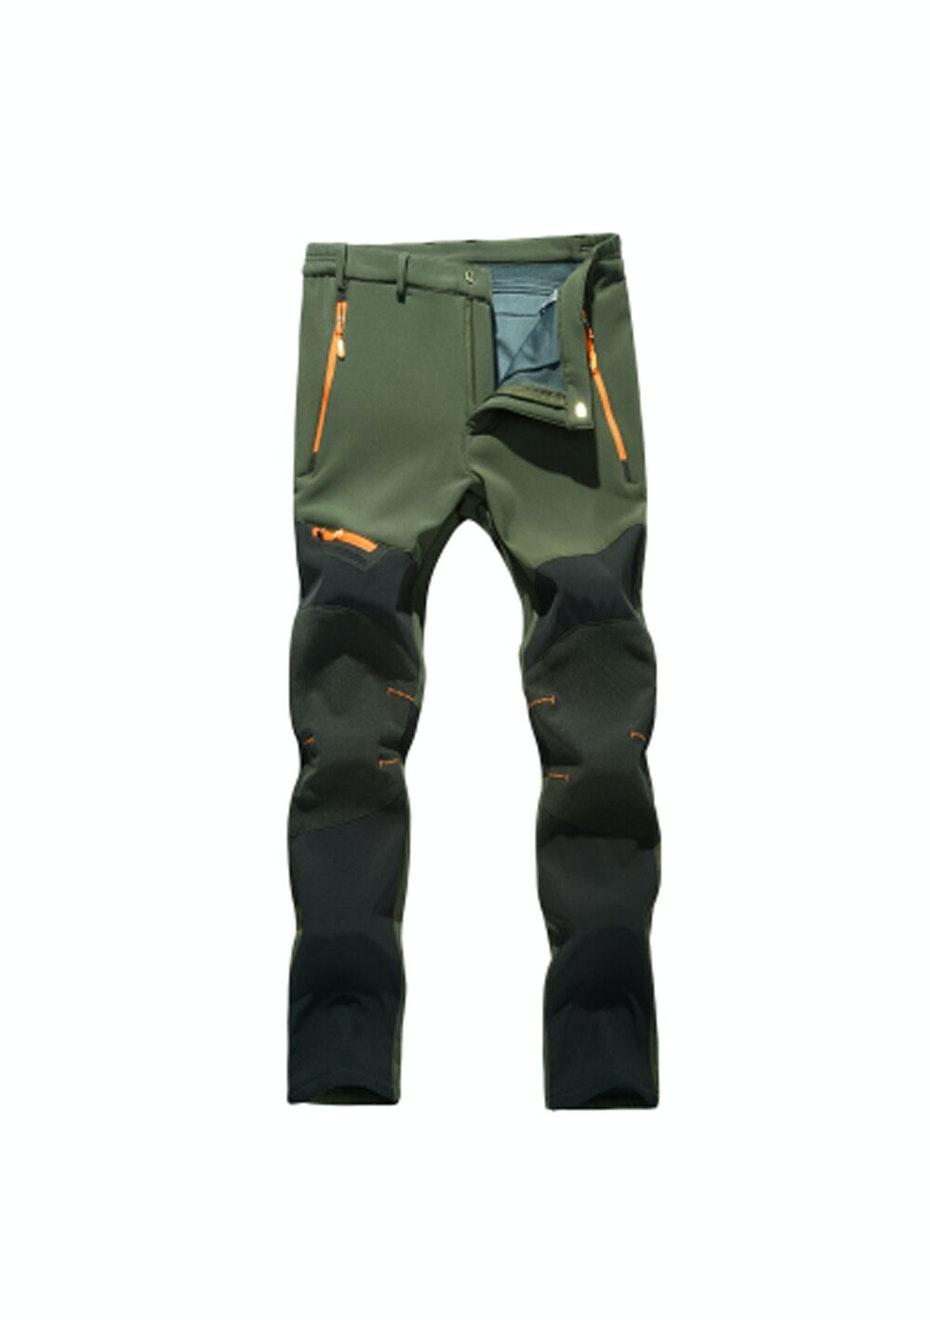 Men 2-in-1 WaterProof Pants - Khaki